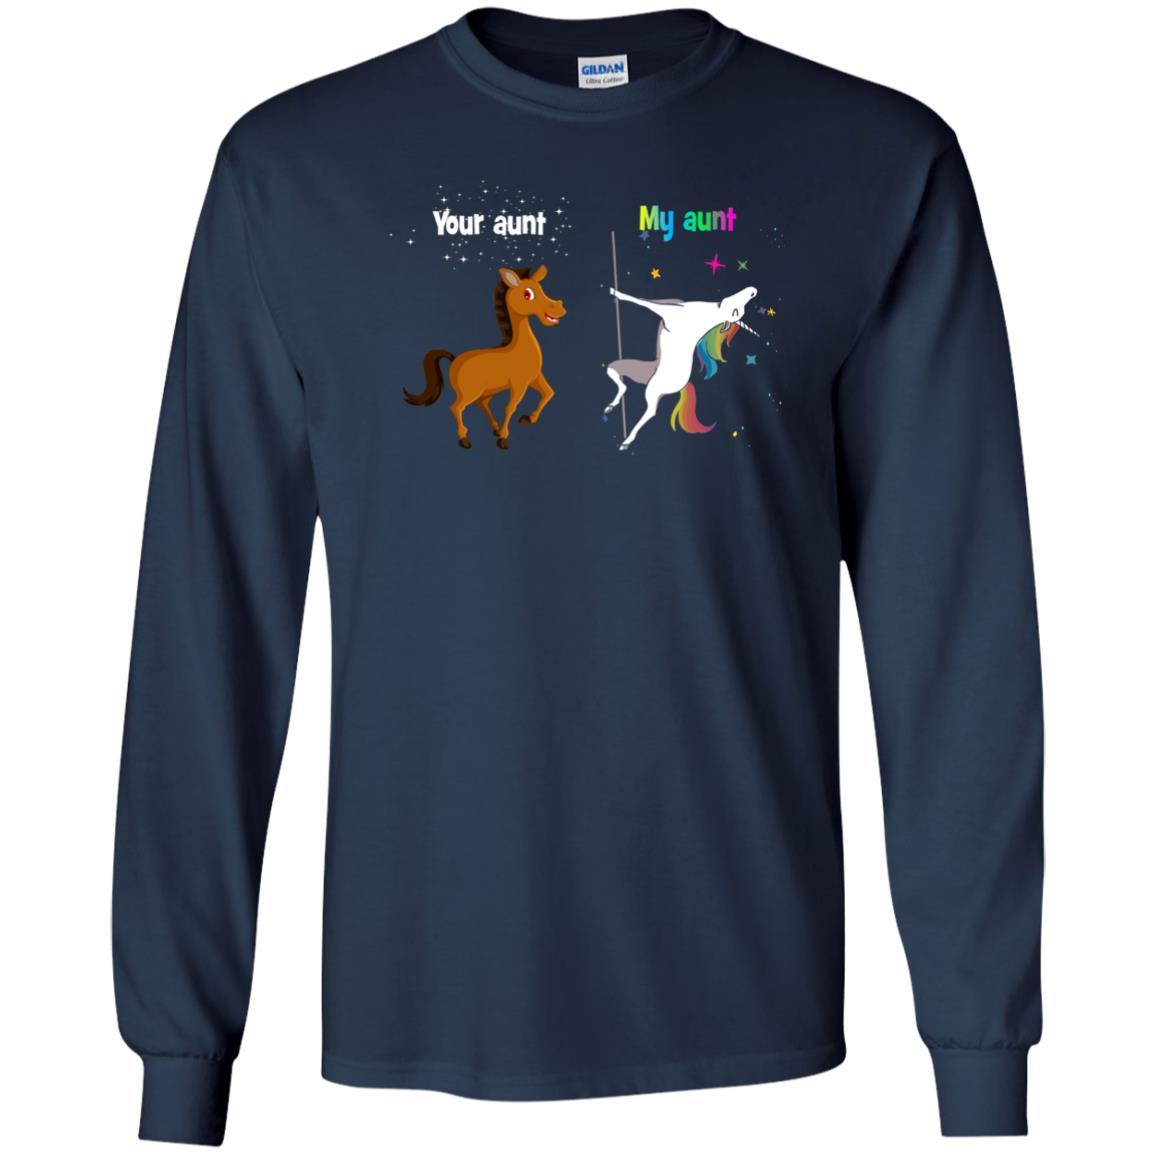 image 938px My aunt unicorn vs your aunt horse t shirt, hoodies, tank top